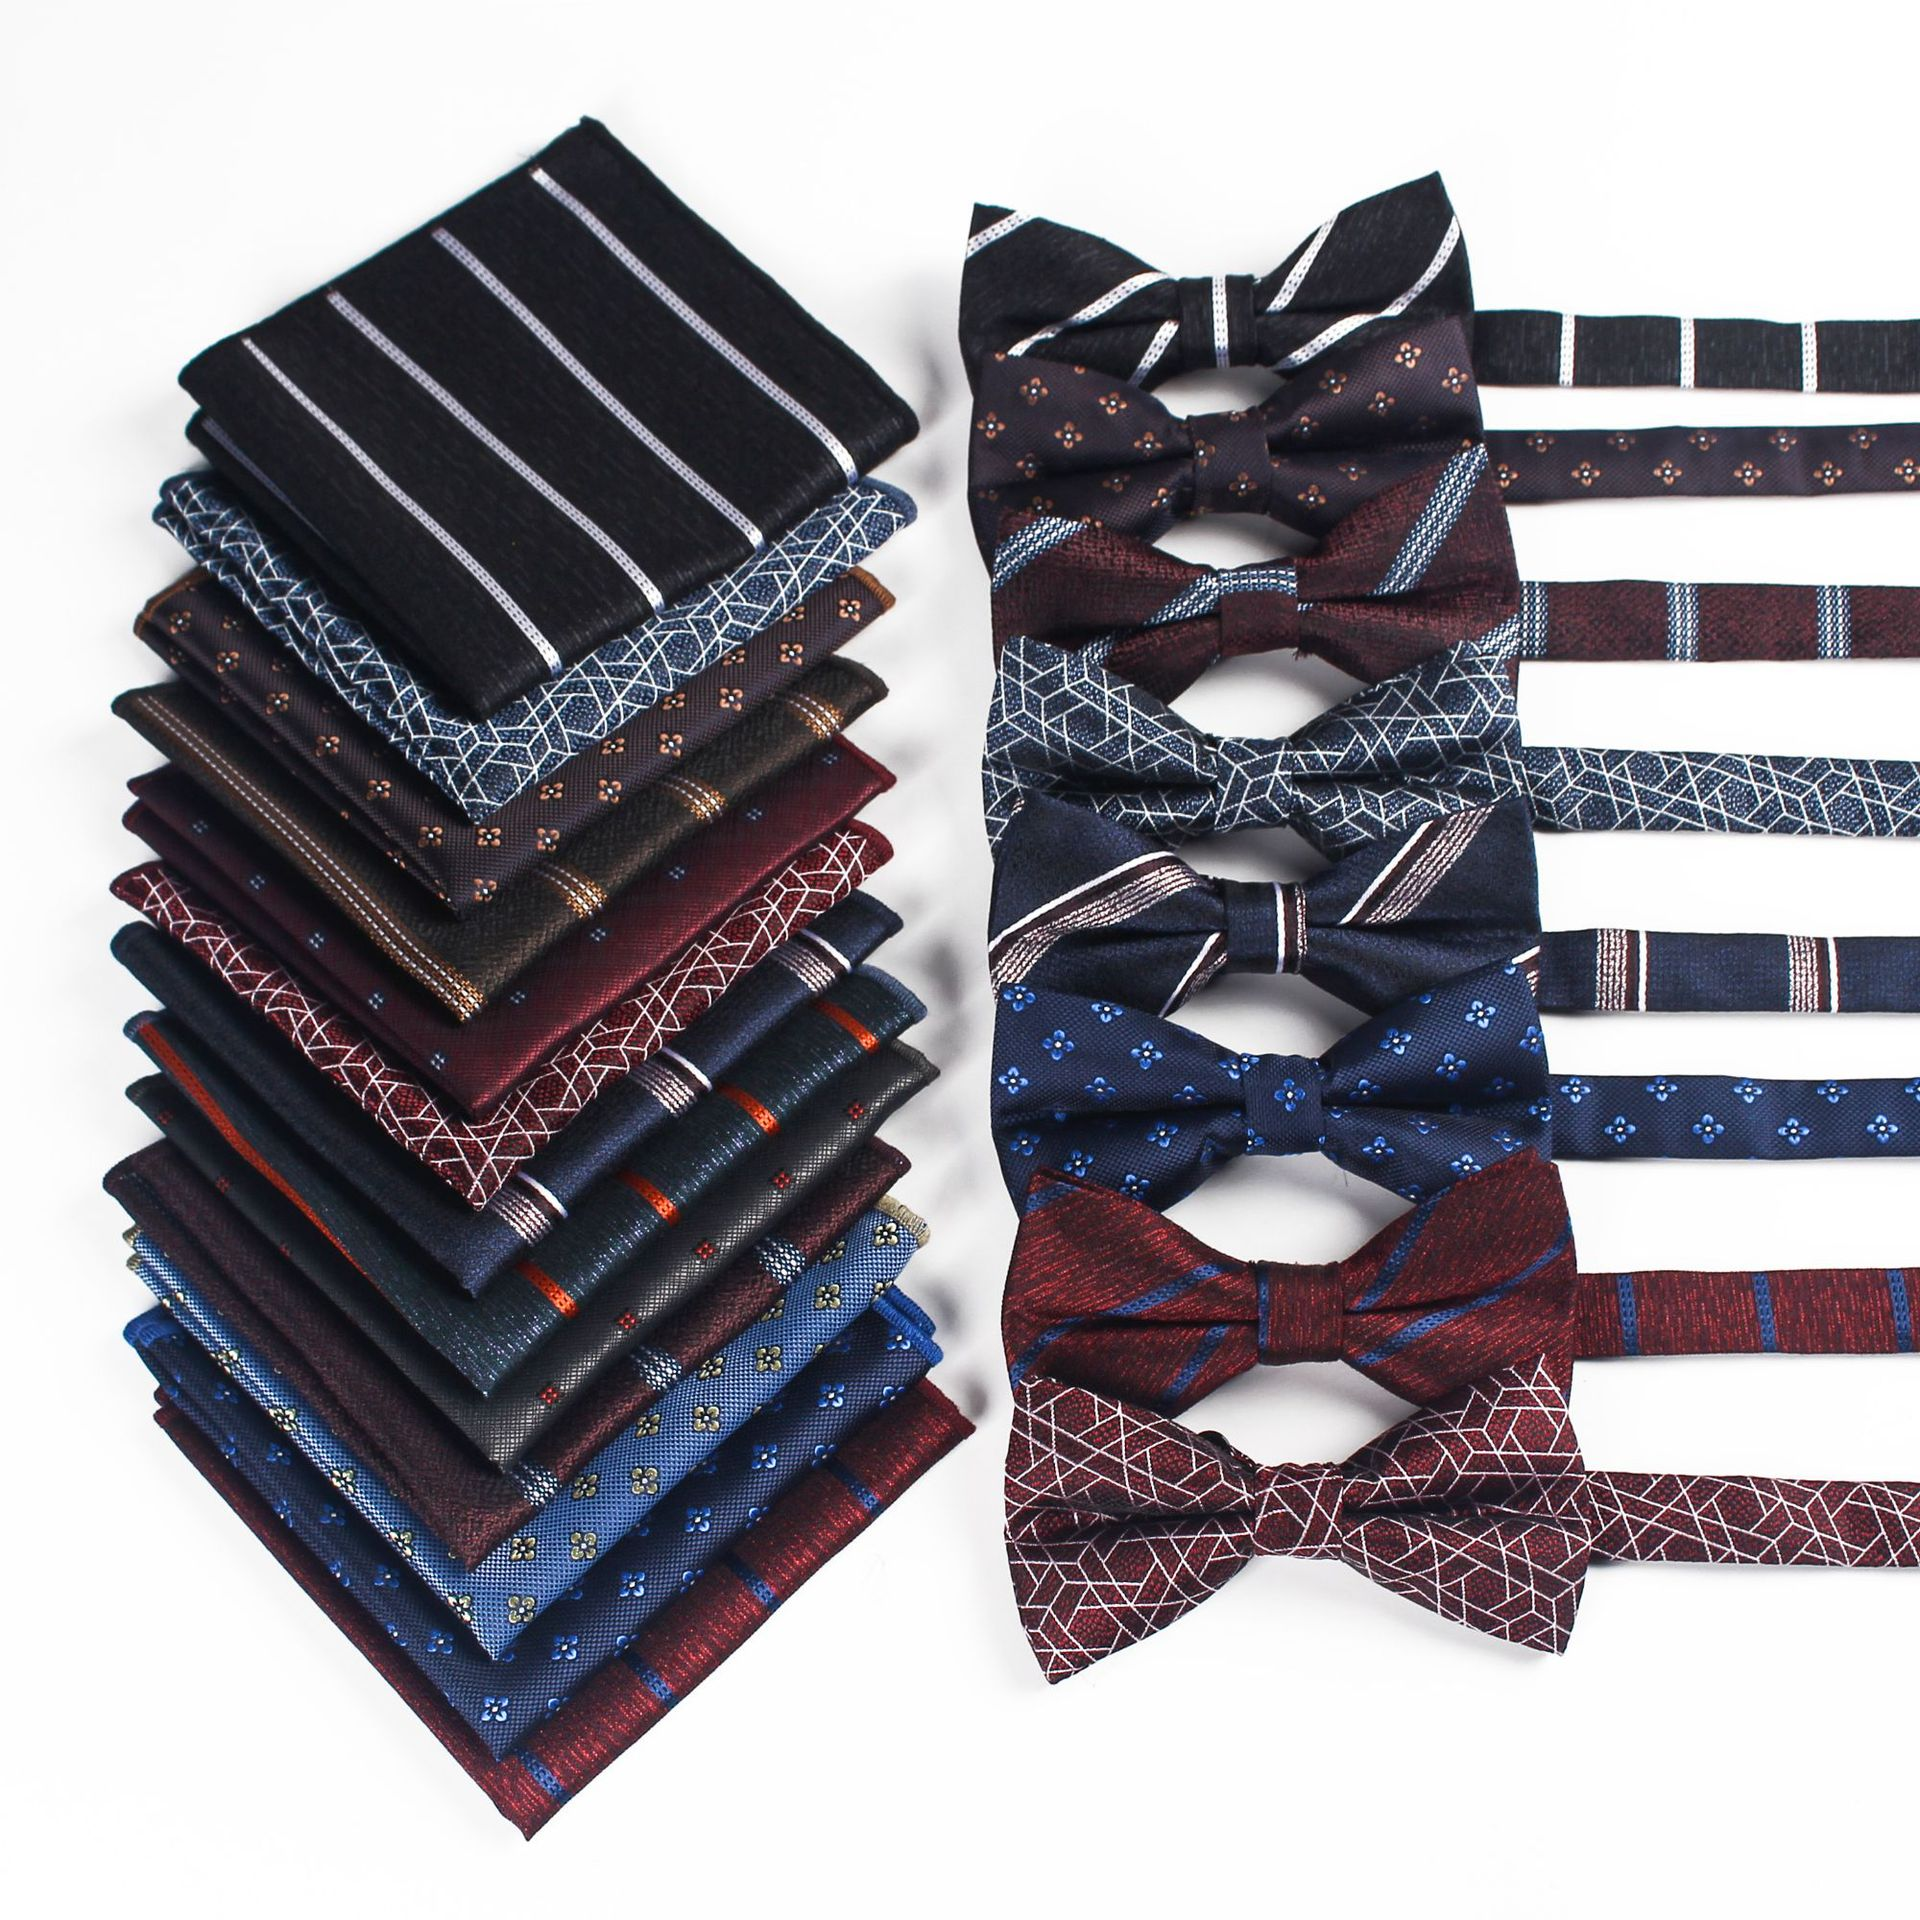 HUISHI Bow Tie Pocket Square Set For Men Wedding Party Business Luxury Bowtie Set Hankerchief Bowknot Wholesale Accessories недорого